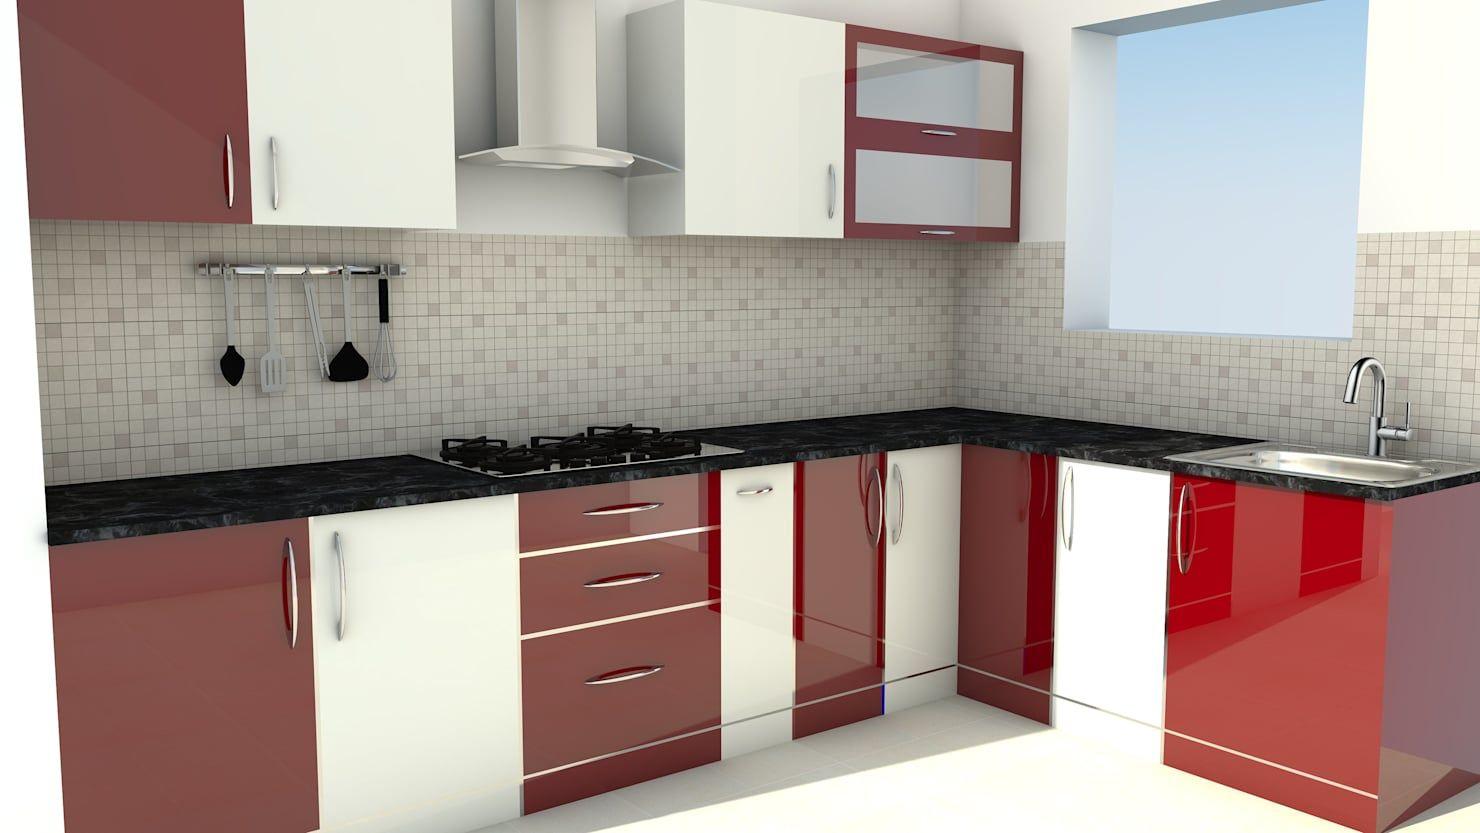 Modular L Shape Kitchen Without Loft Kitchen By Servicebell Solutions Pvt Ltd Latest Kitchen Cabinet Design Kitchen Modular L Shaped Kitchen